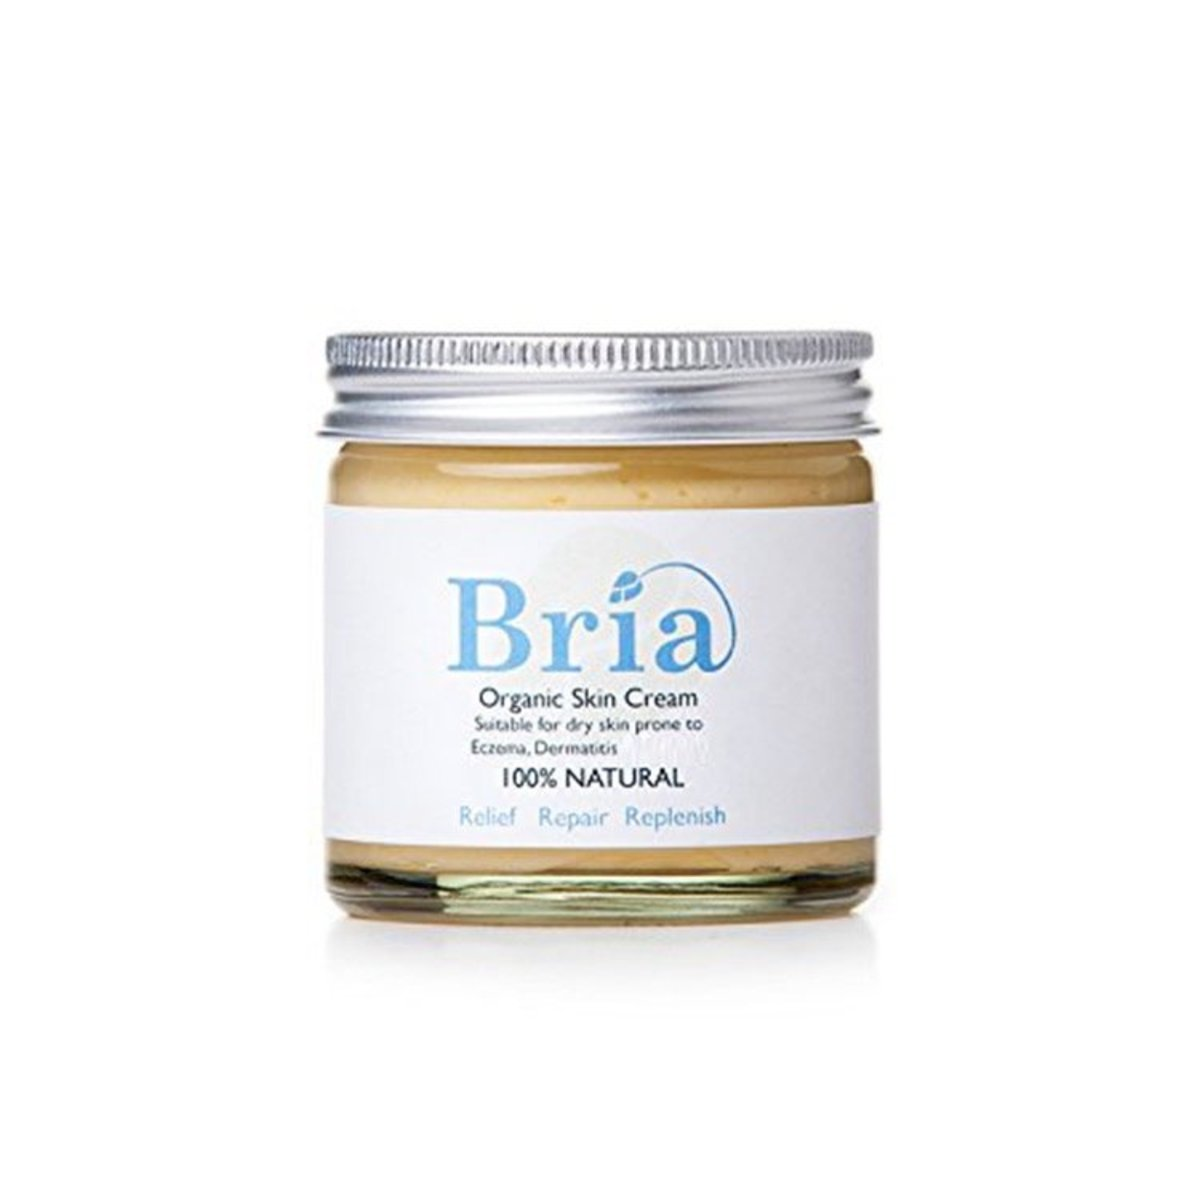 Organic Cream (prone to Eczema, Dermatitis & more)